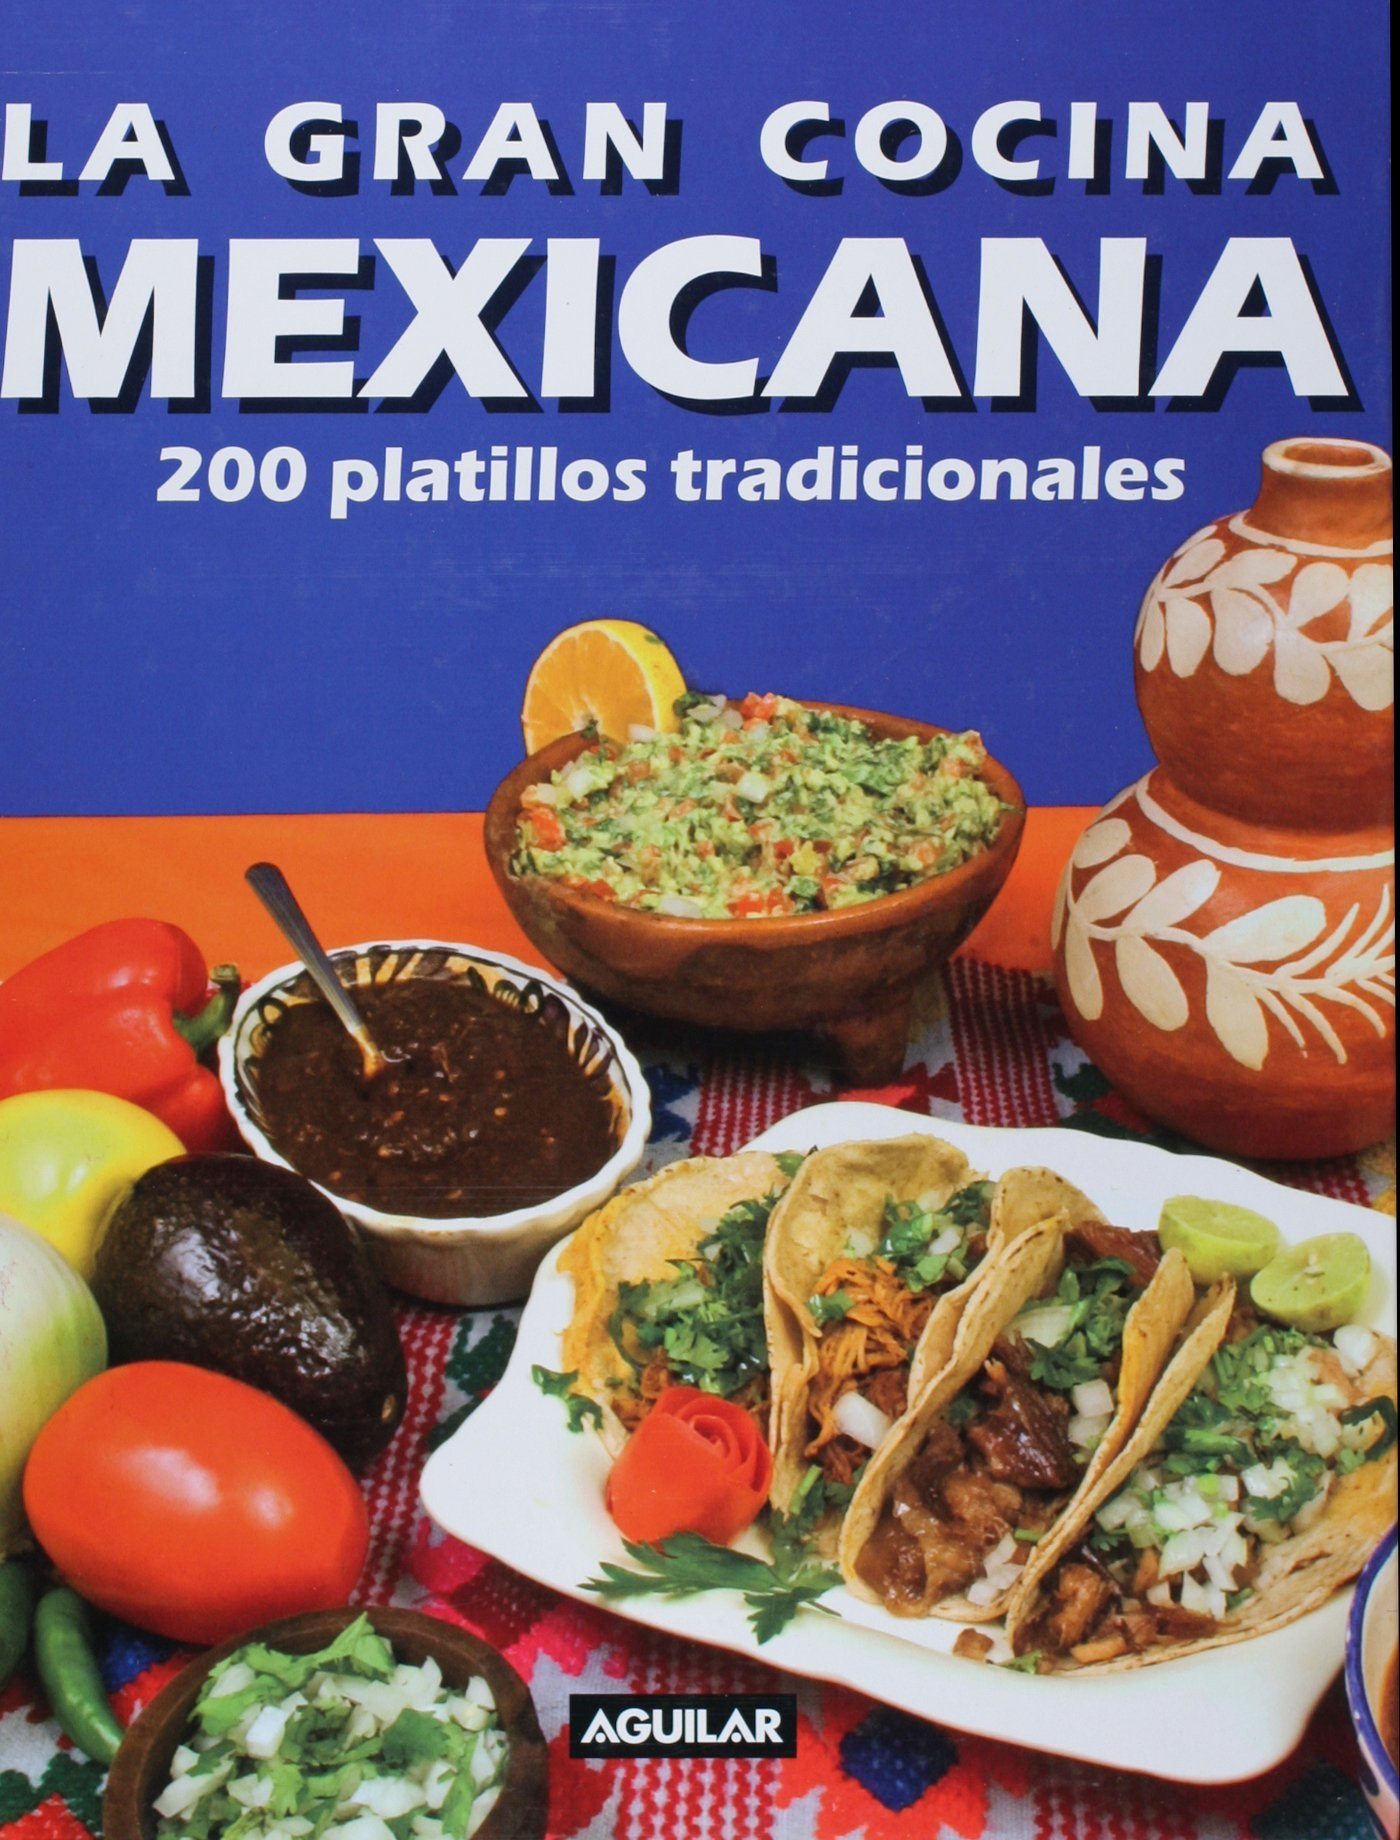 La Gran Cocina Mexicana Spanish Edition Aguilar 9781603962513